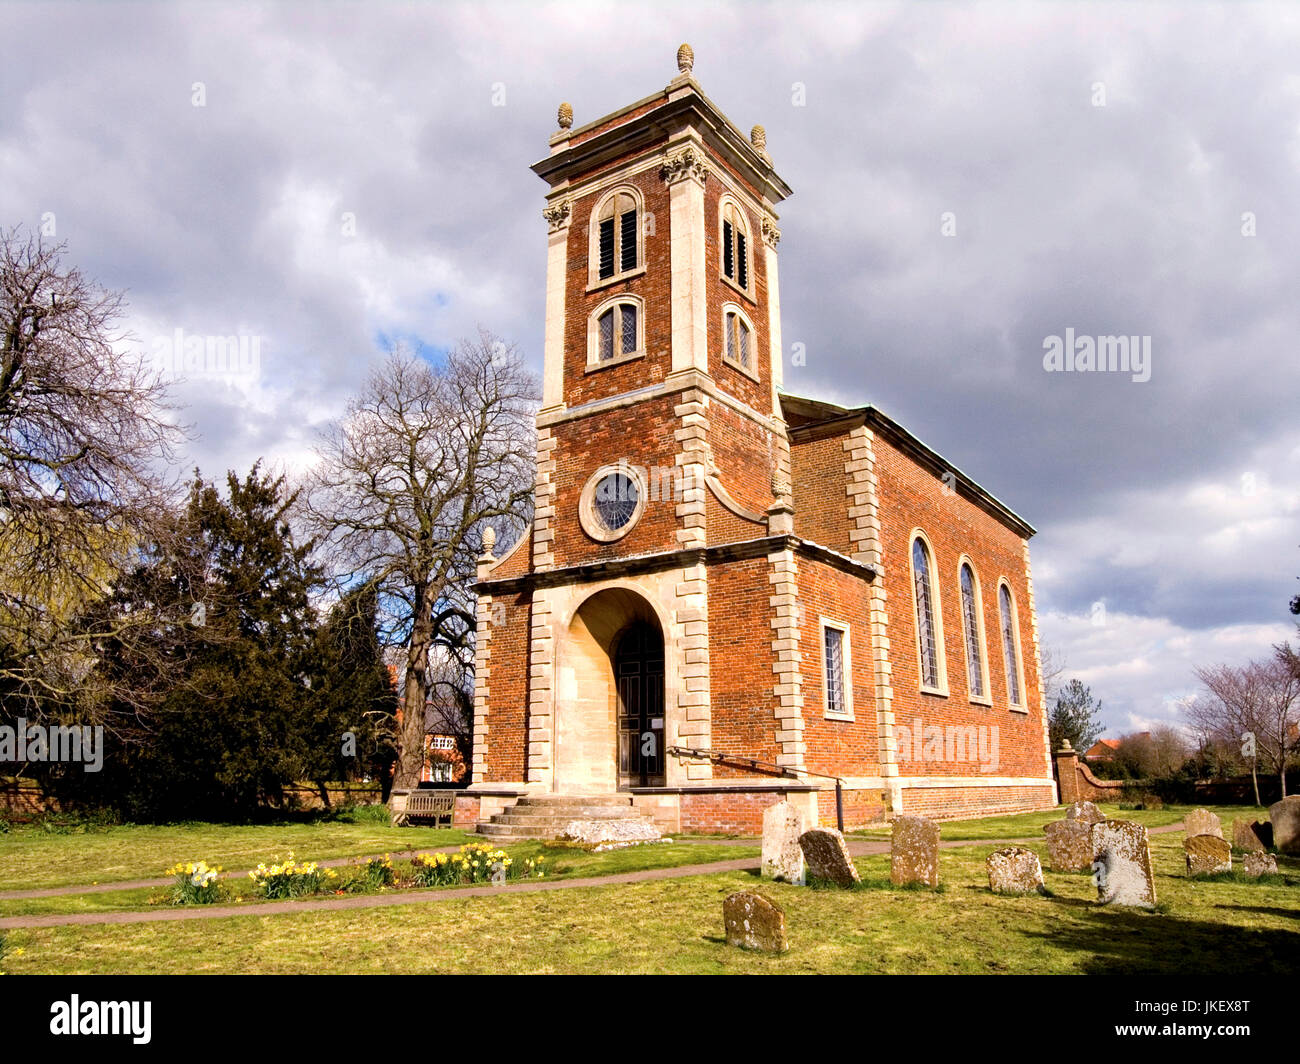 Willen Church Milton Keynes - Stock Image